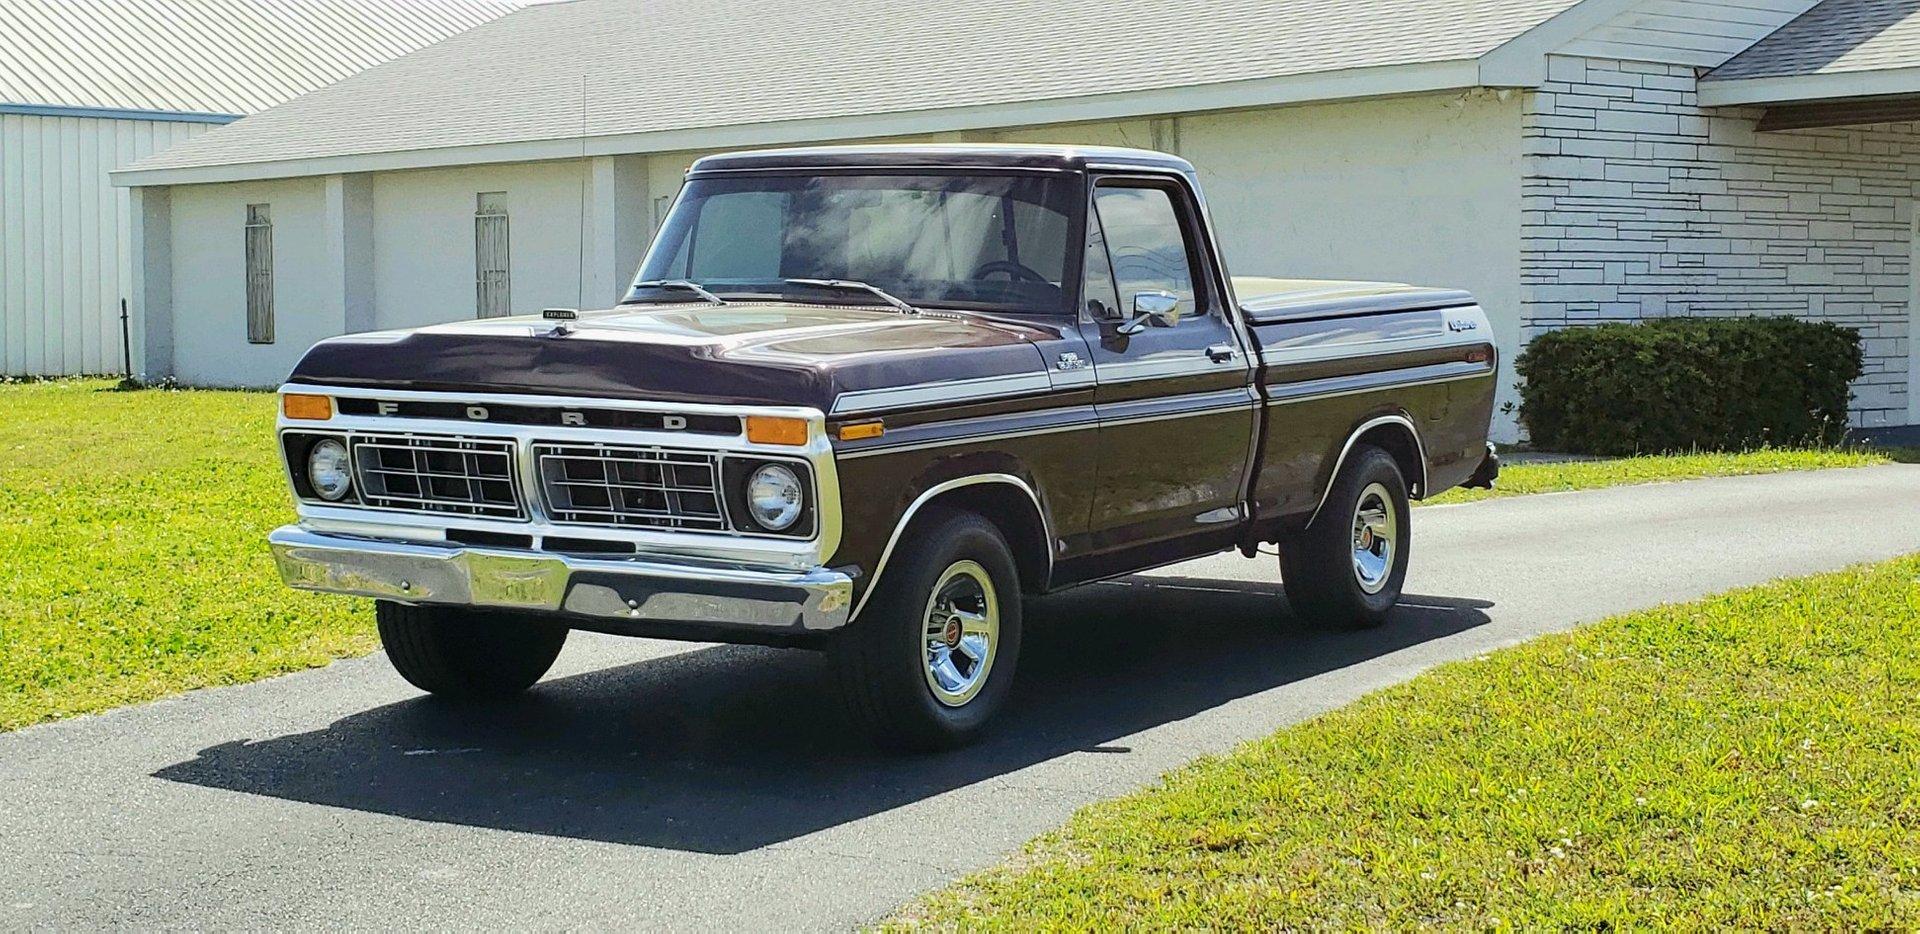 1977 ford f100 xlt shortbed pickup